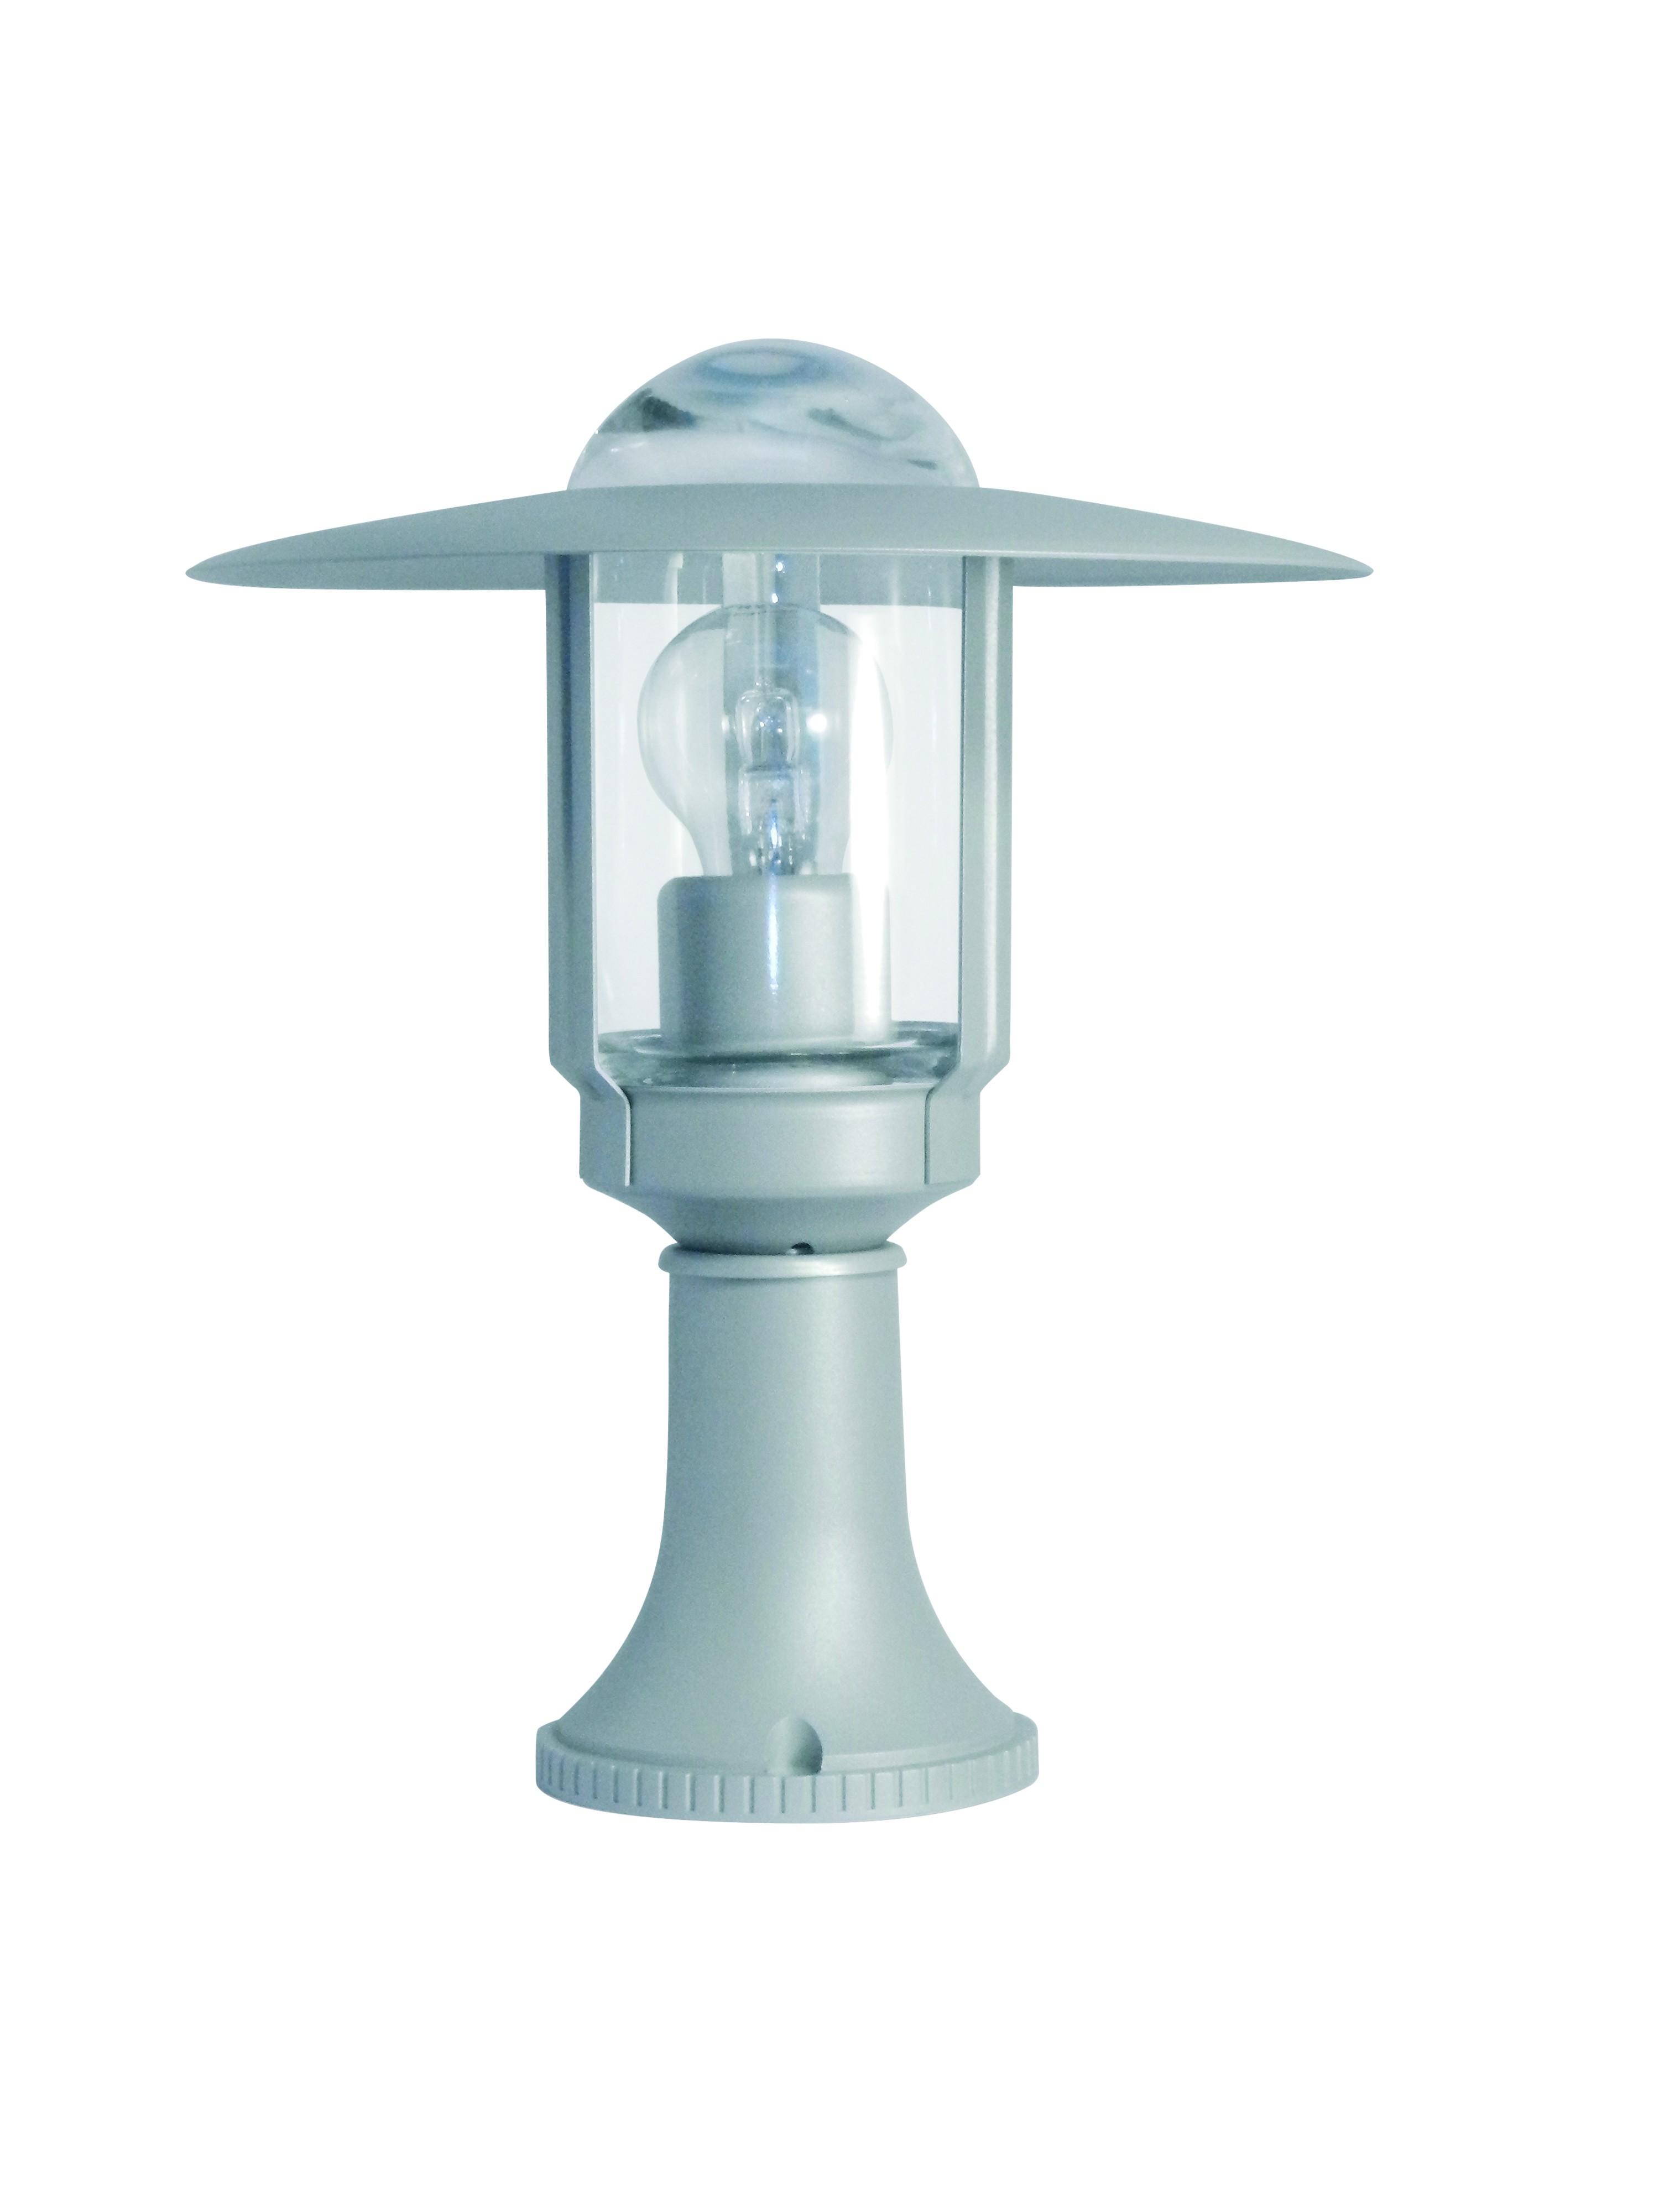 luminaire roger pradier lampe et clairage roger pradier. Black Bedroom Furniture Sets. Home Design Ideas